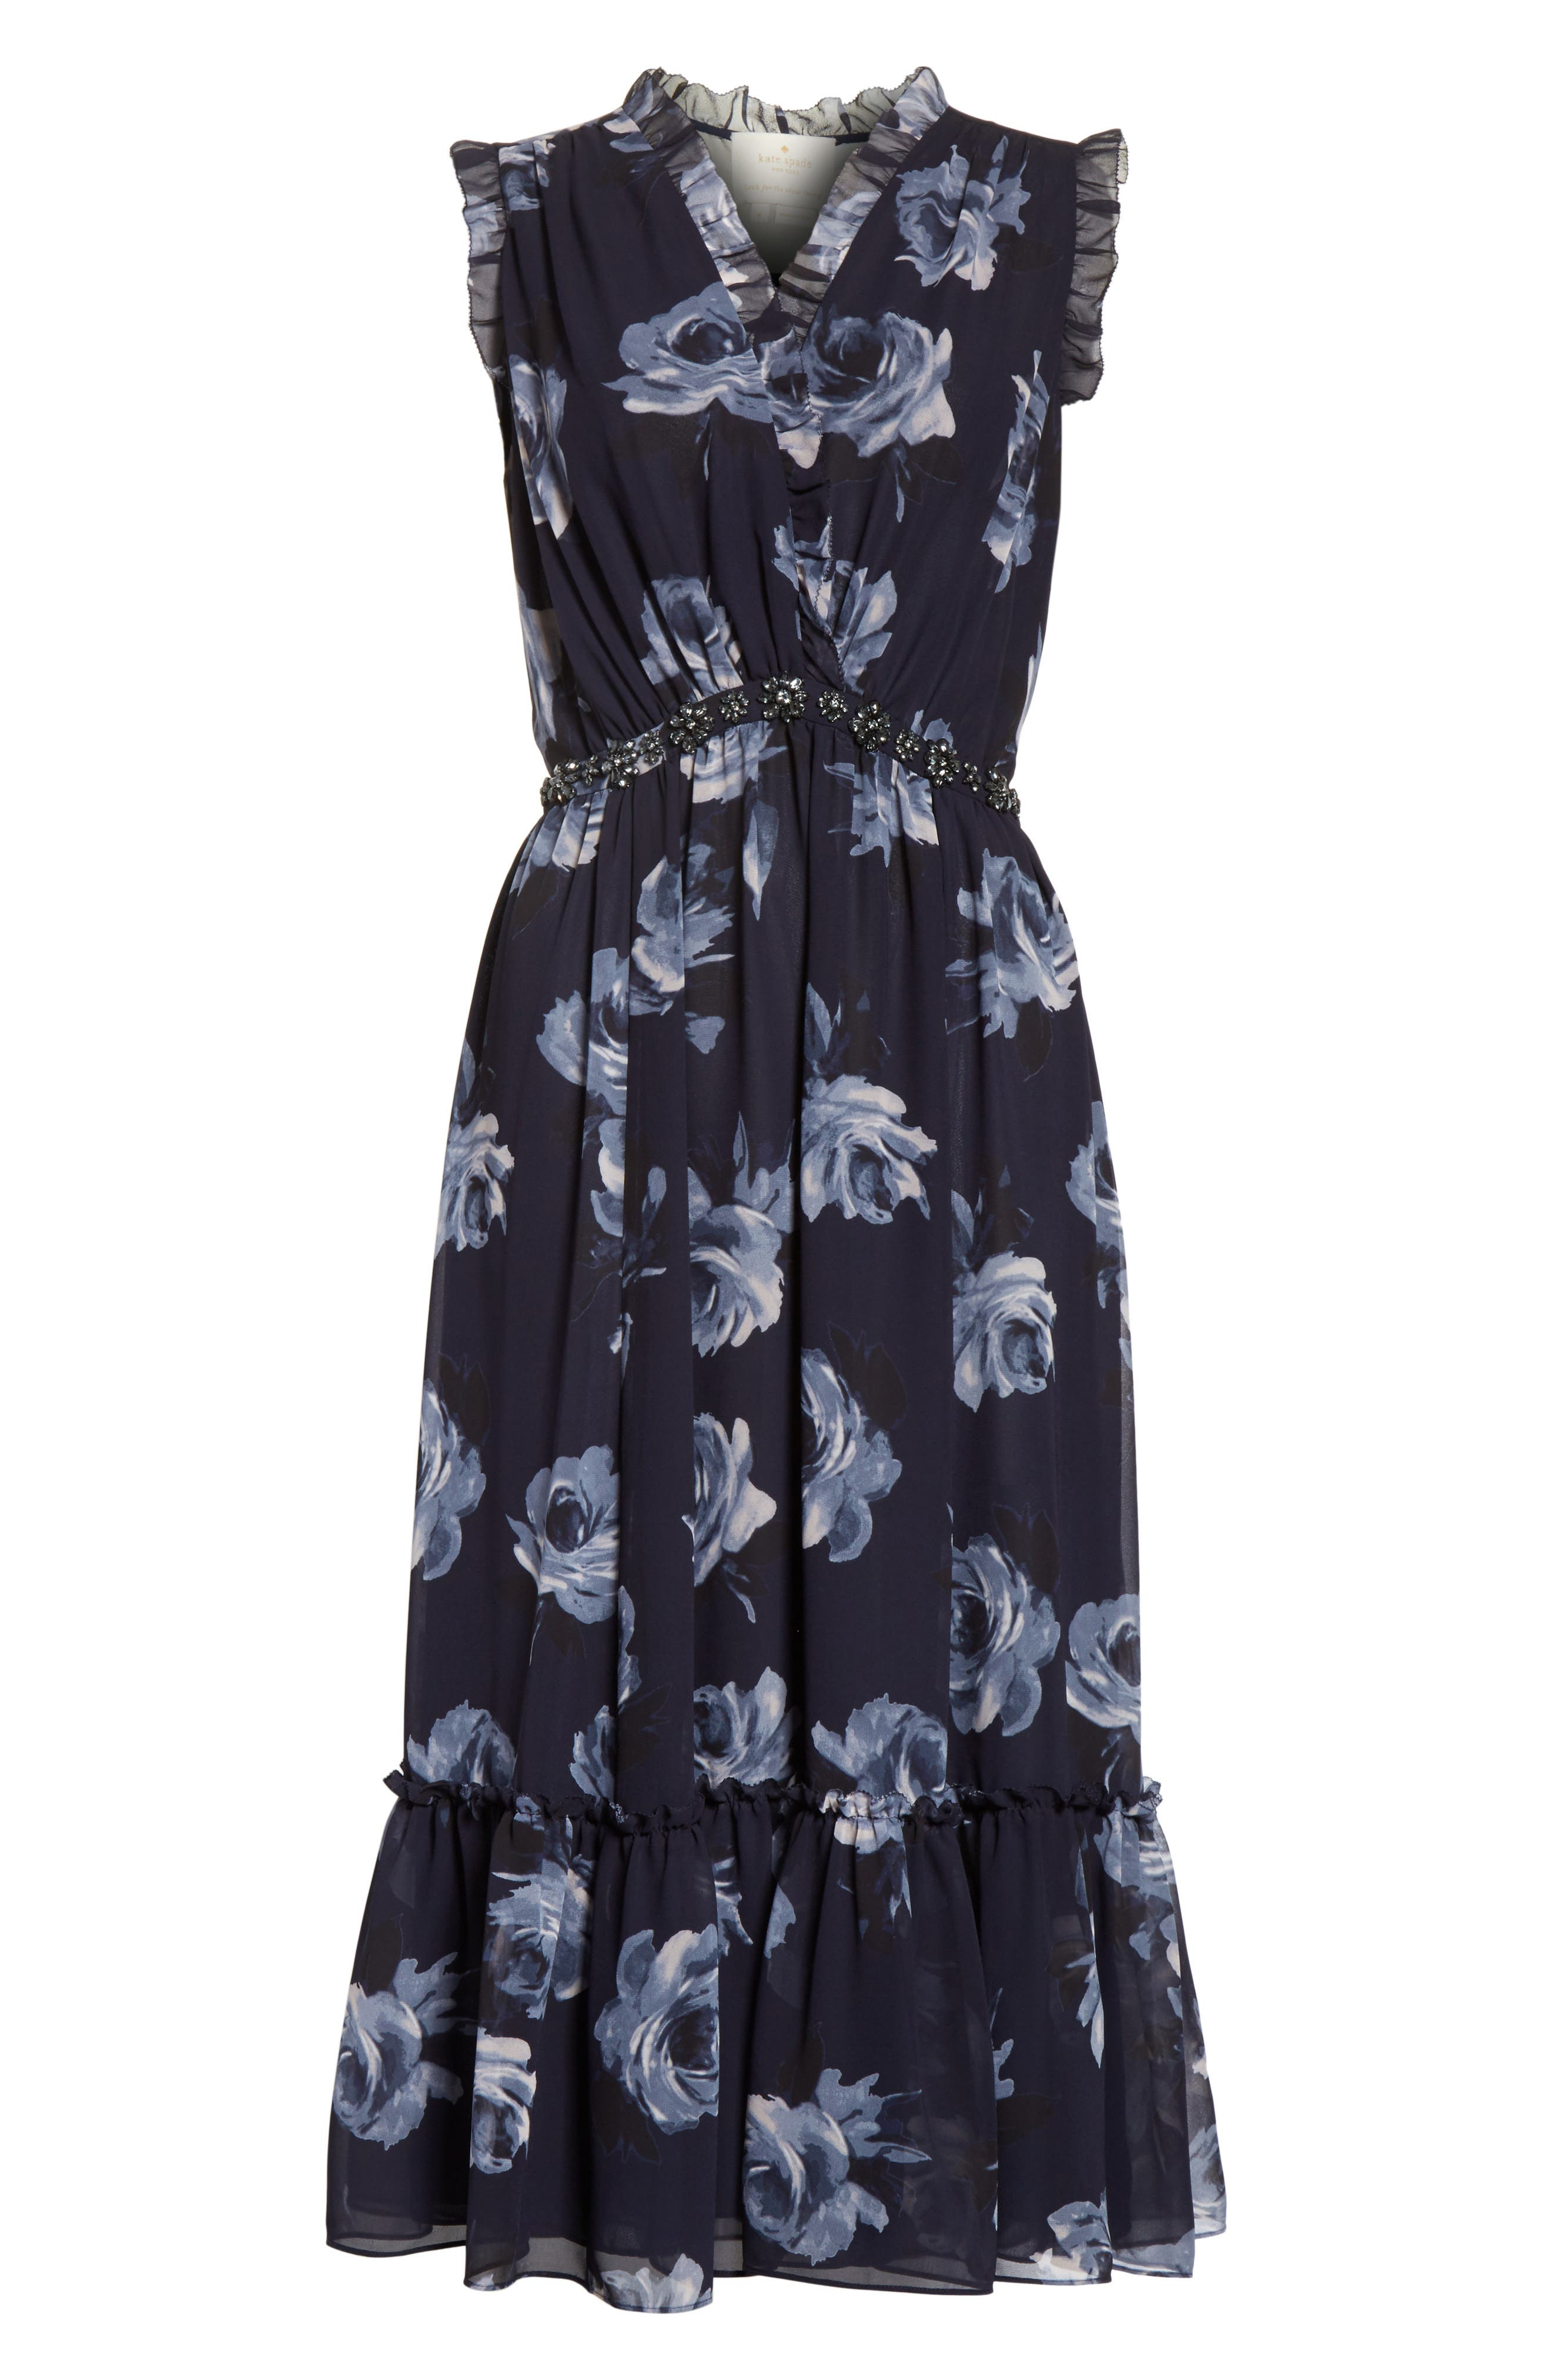 kade spade new york Night Rose Chiffon Midi Dress,                             Alternate thumbnail 6, color,                             Rich Navy